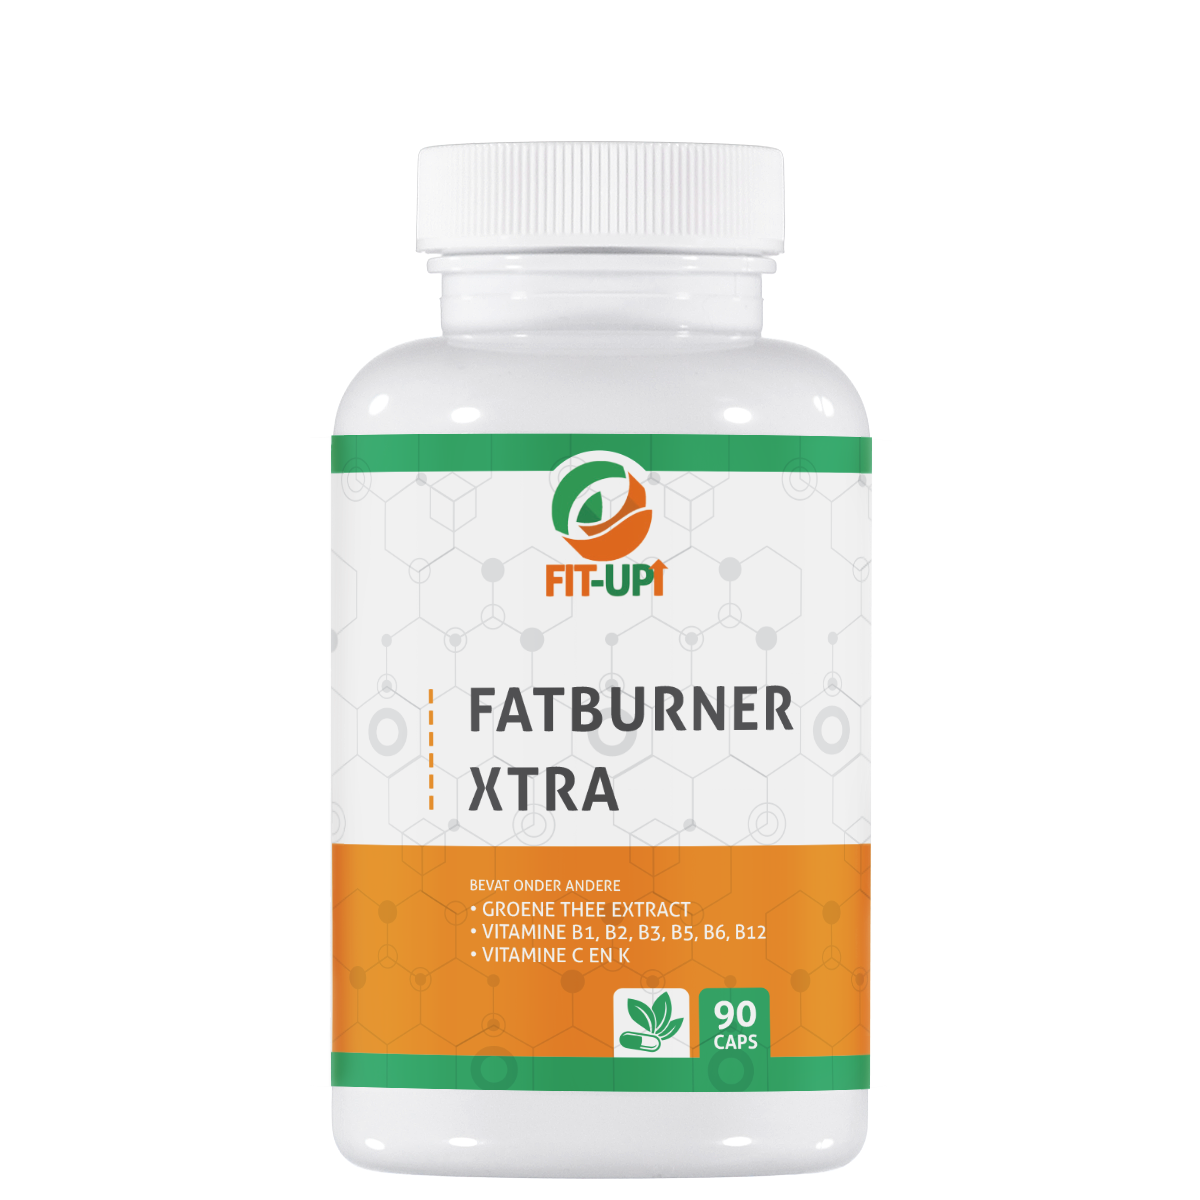 Fatburner XTRA - 90 capsules